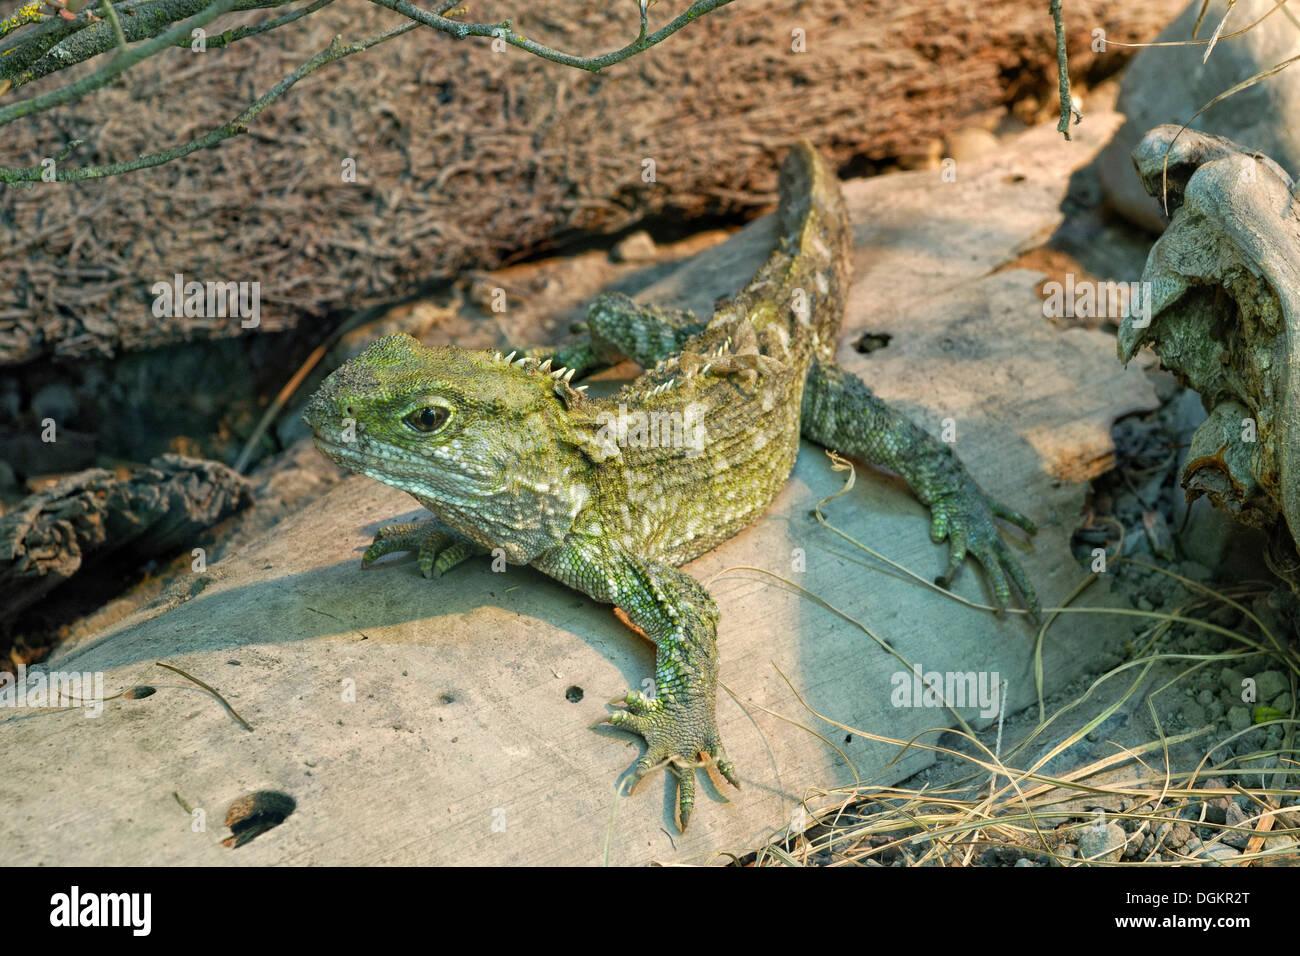 Tuatara (Sphenodon punctatus), endemic, critically endangered species, prehistoric reptile, Willowbank Wildlife Reserve - Stock Image